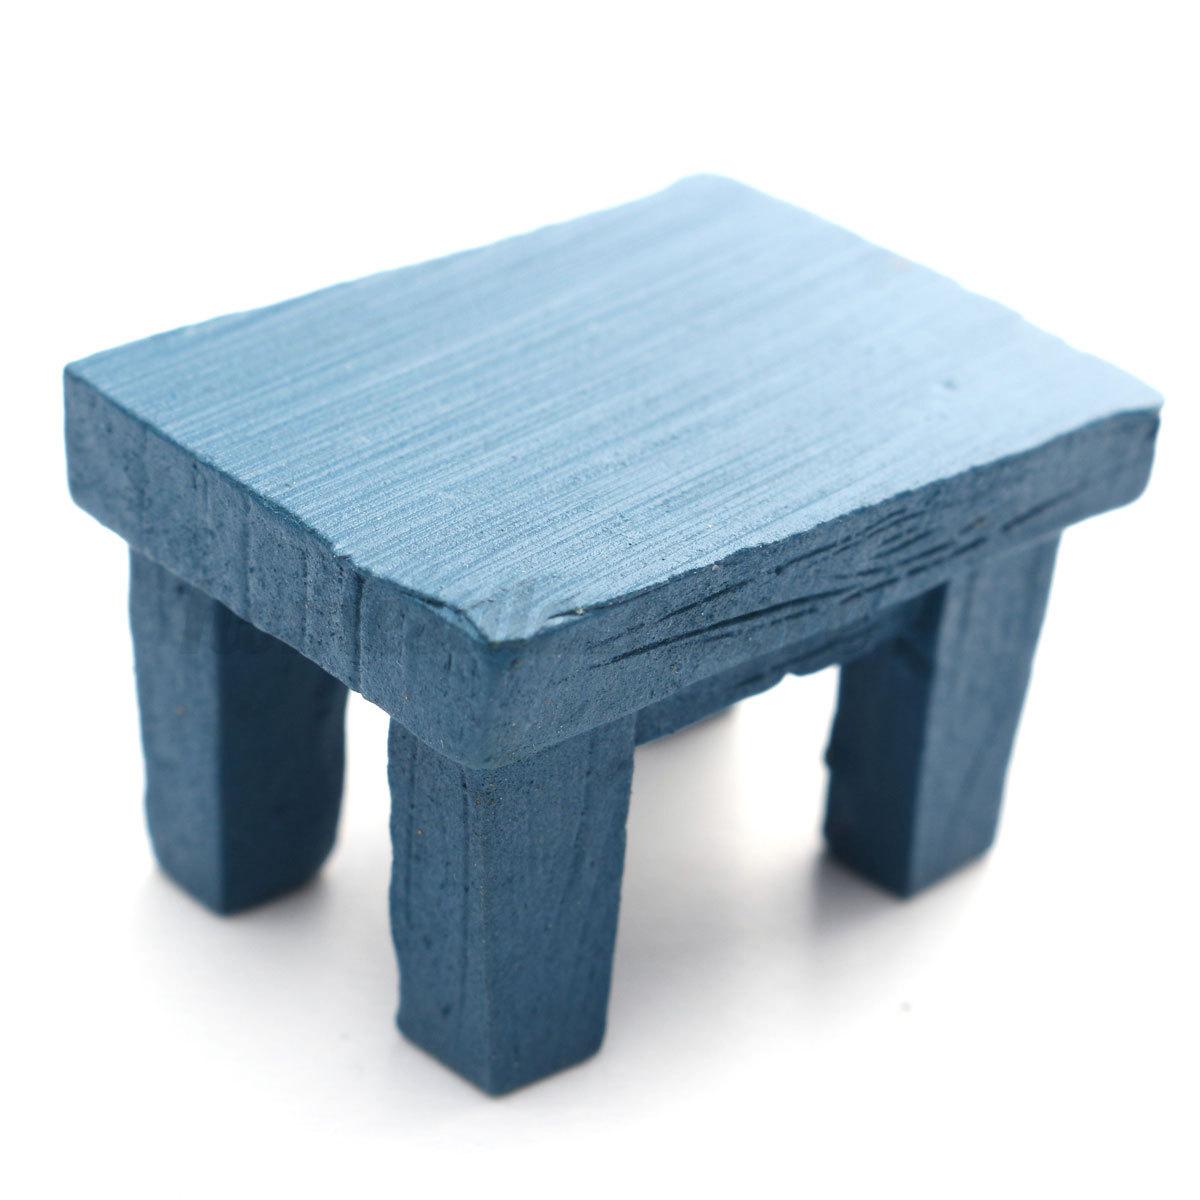 Mini Fairy Garden Wooden Chair Seashore Bench DollHouse